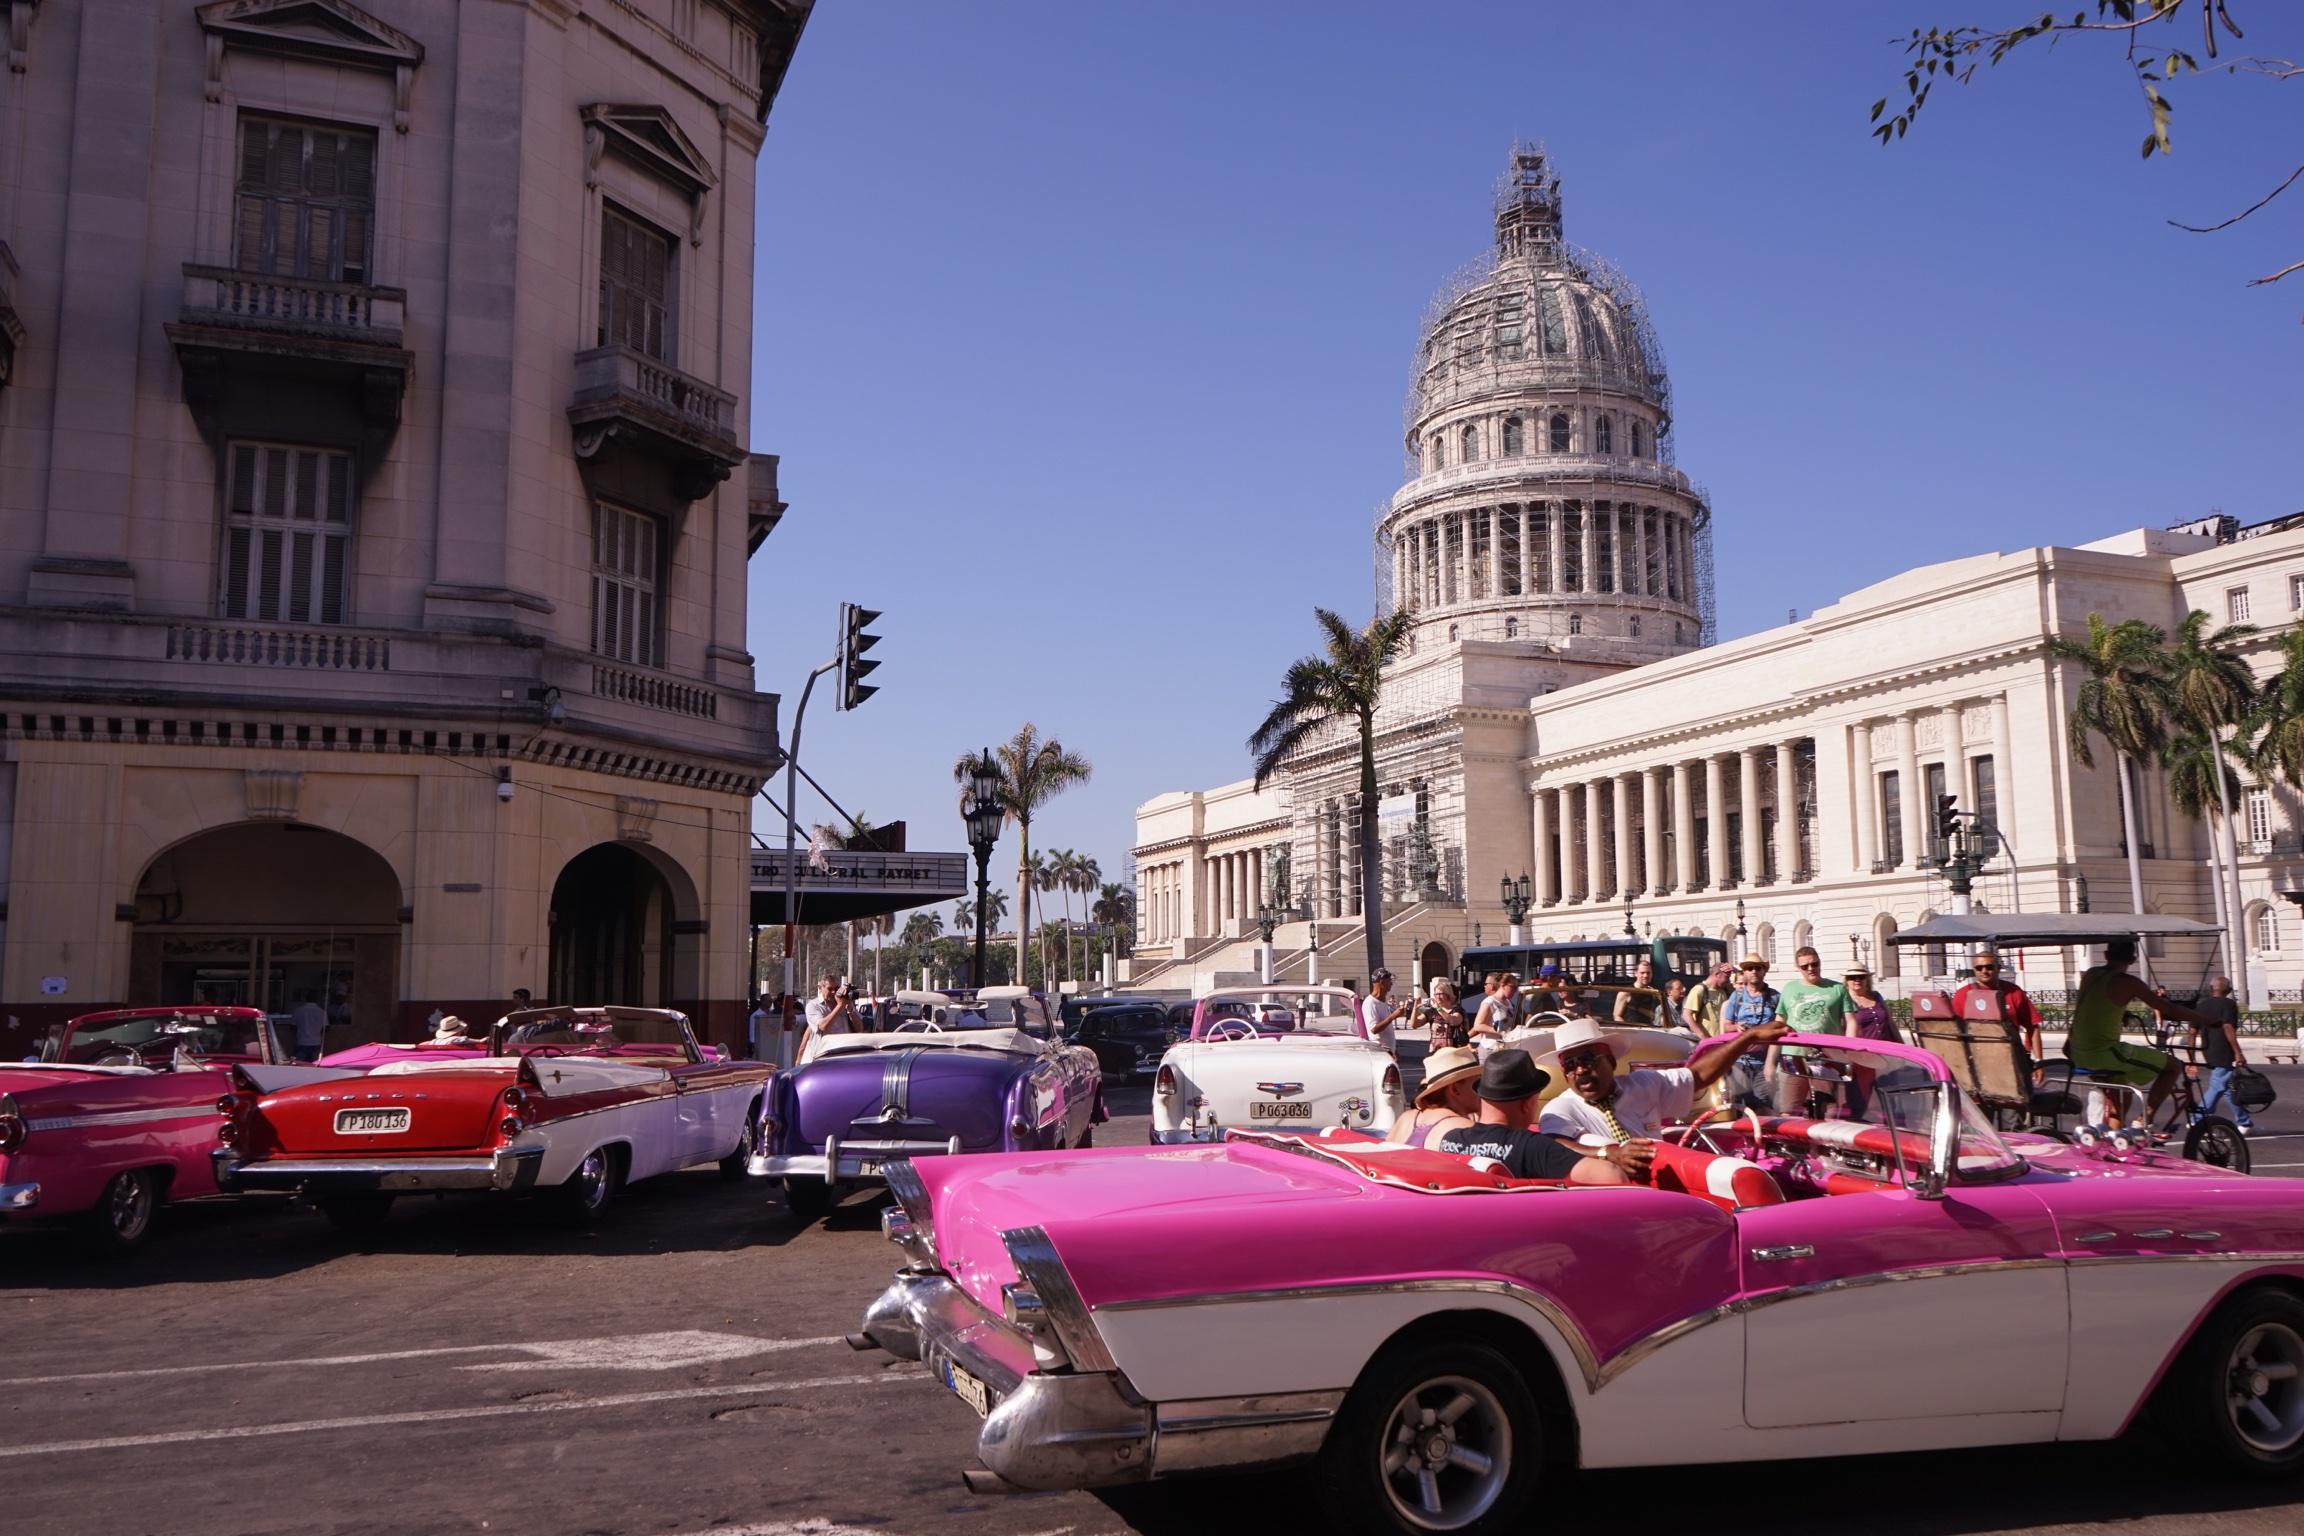 IMG 0044 - 【キューバ ハバナ・バラデロ・トリニダー】キューバでは絶対に行きたい三大観光地の歩き方。